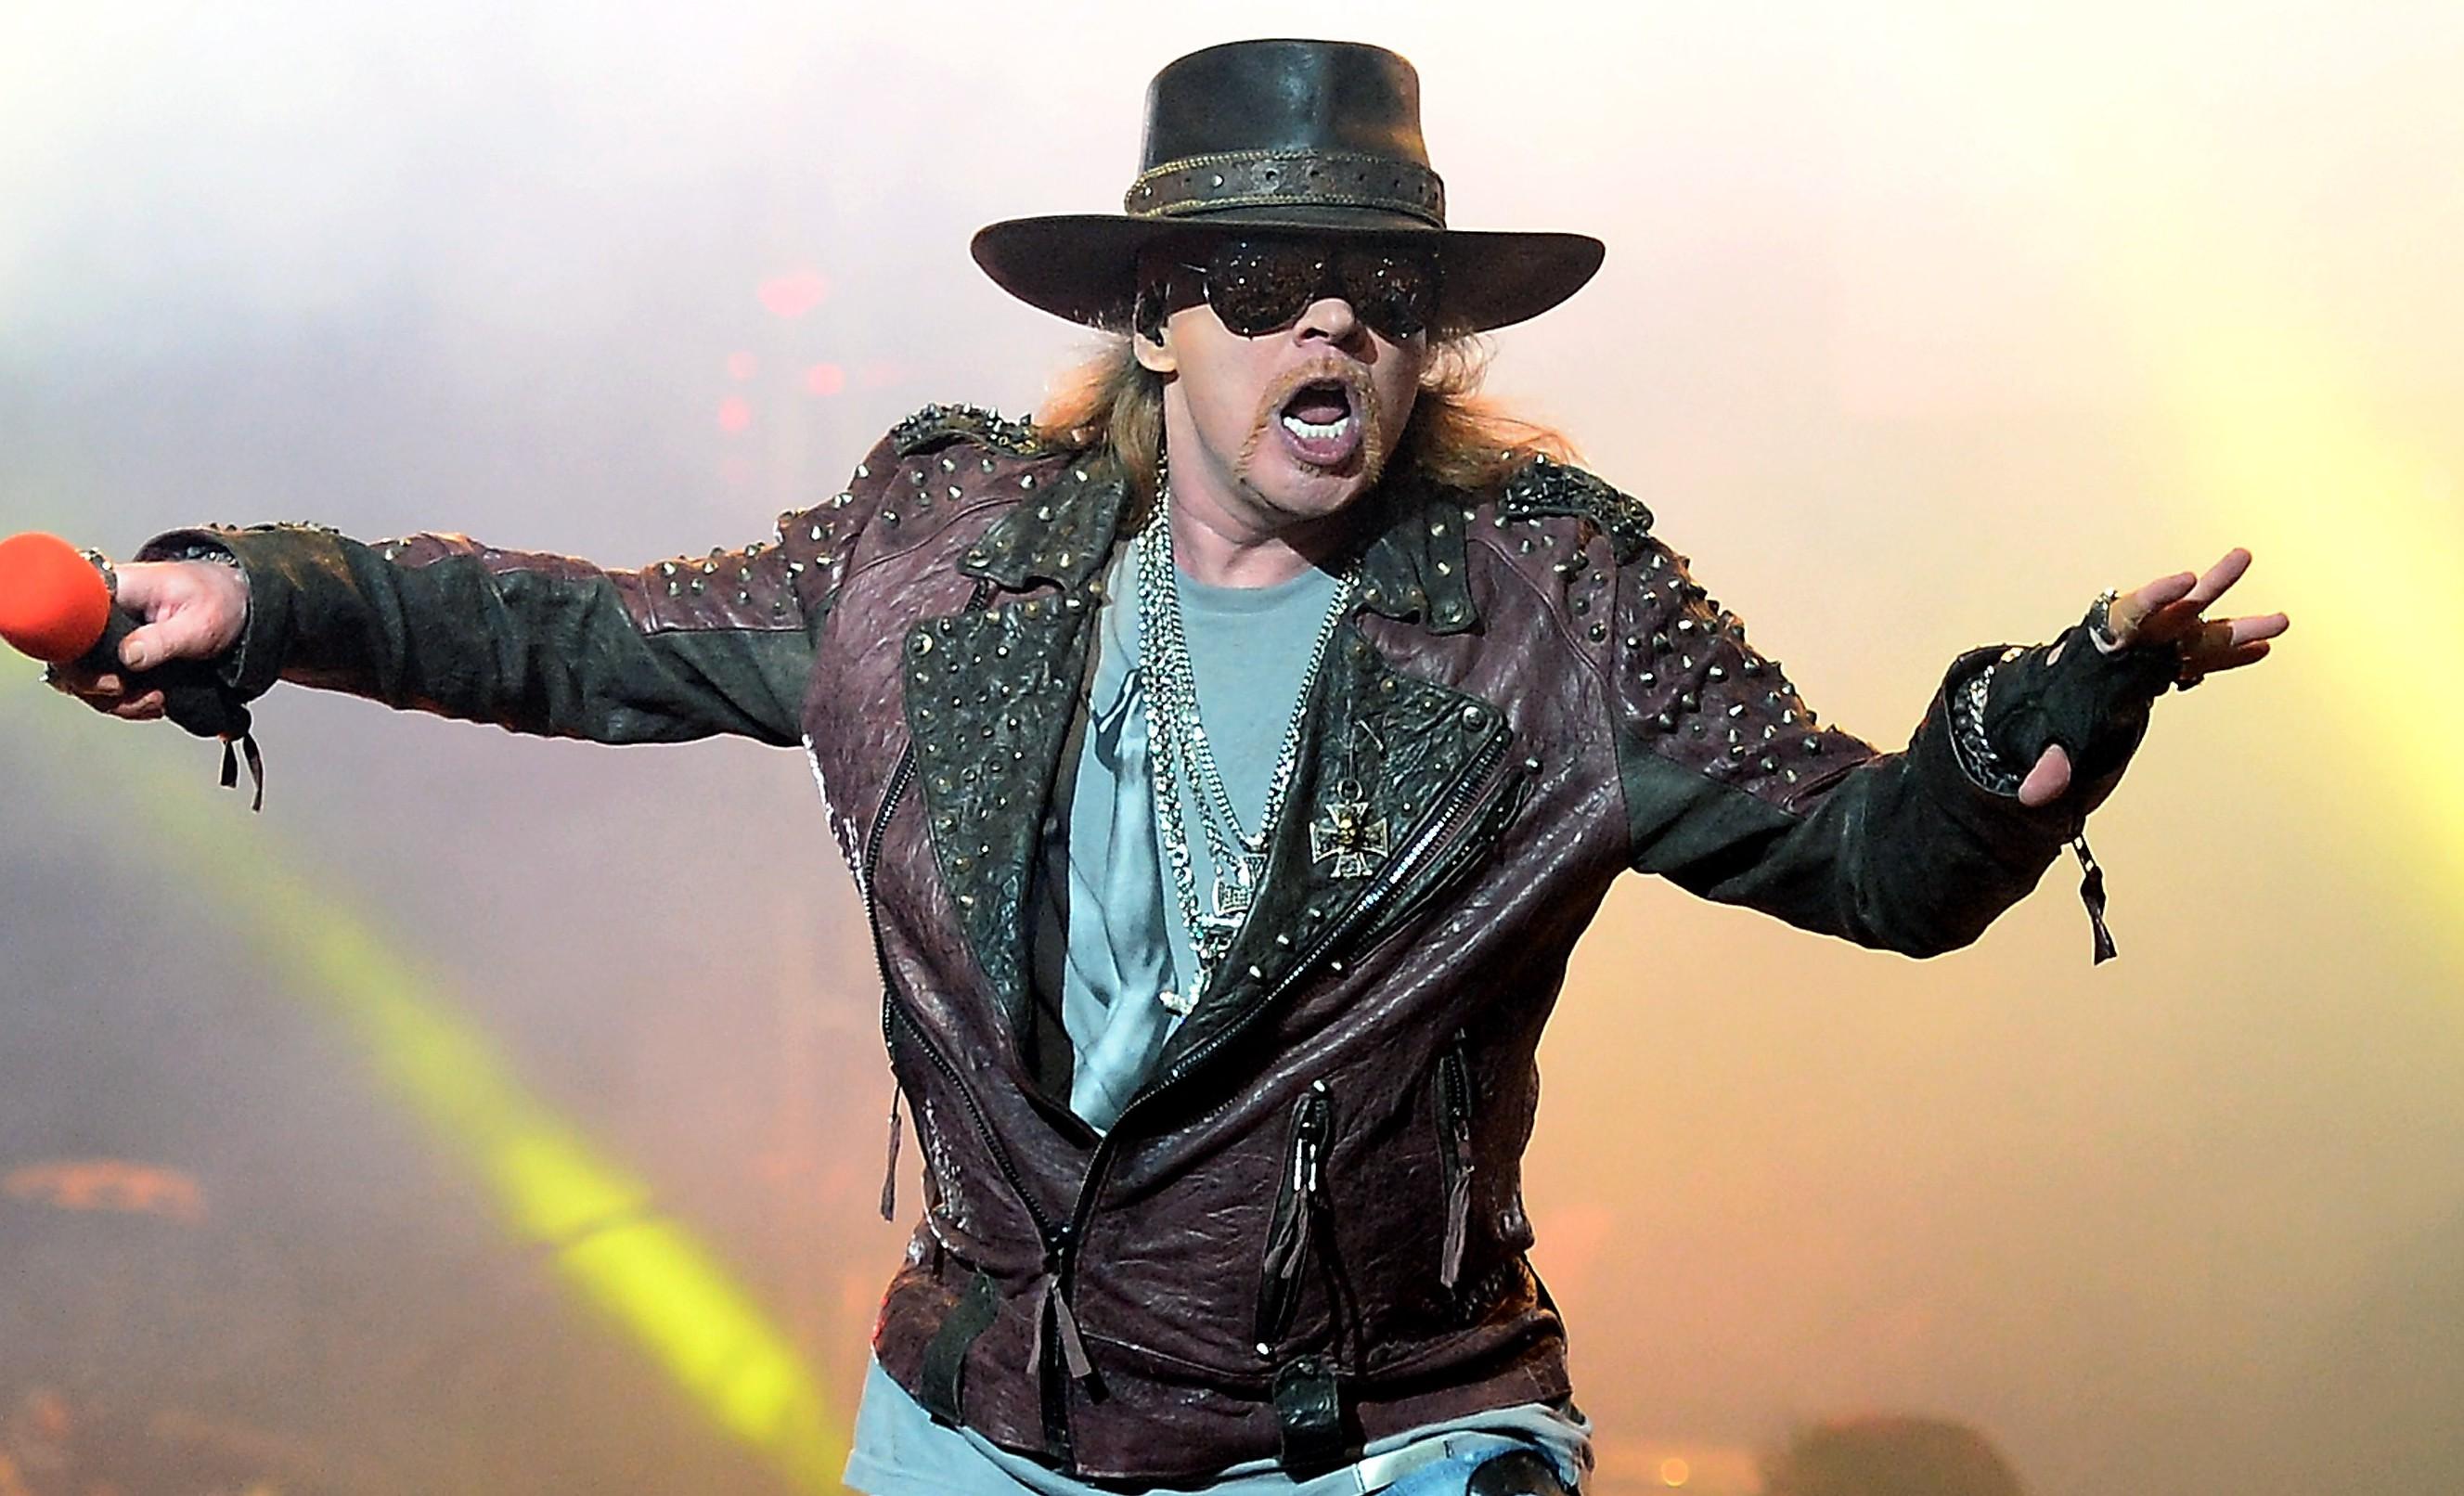 Axl Rose just addressed those Guns N' Roses reunion rumours